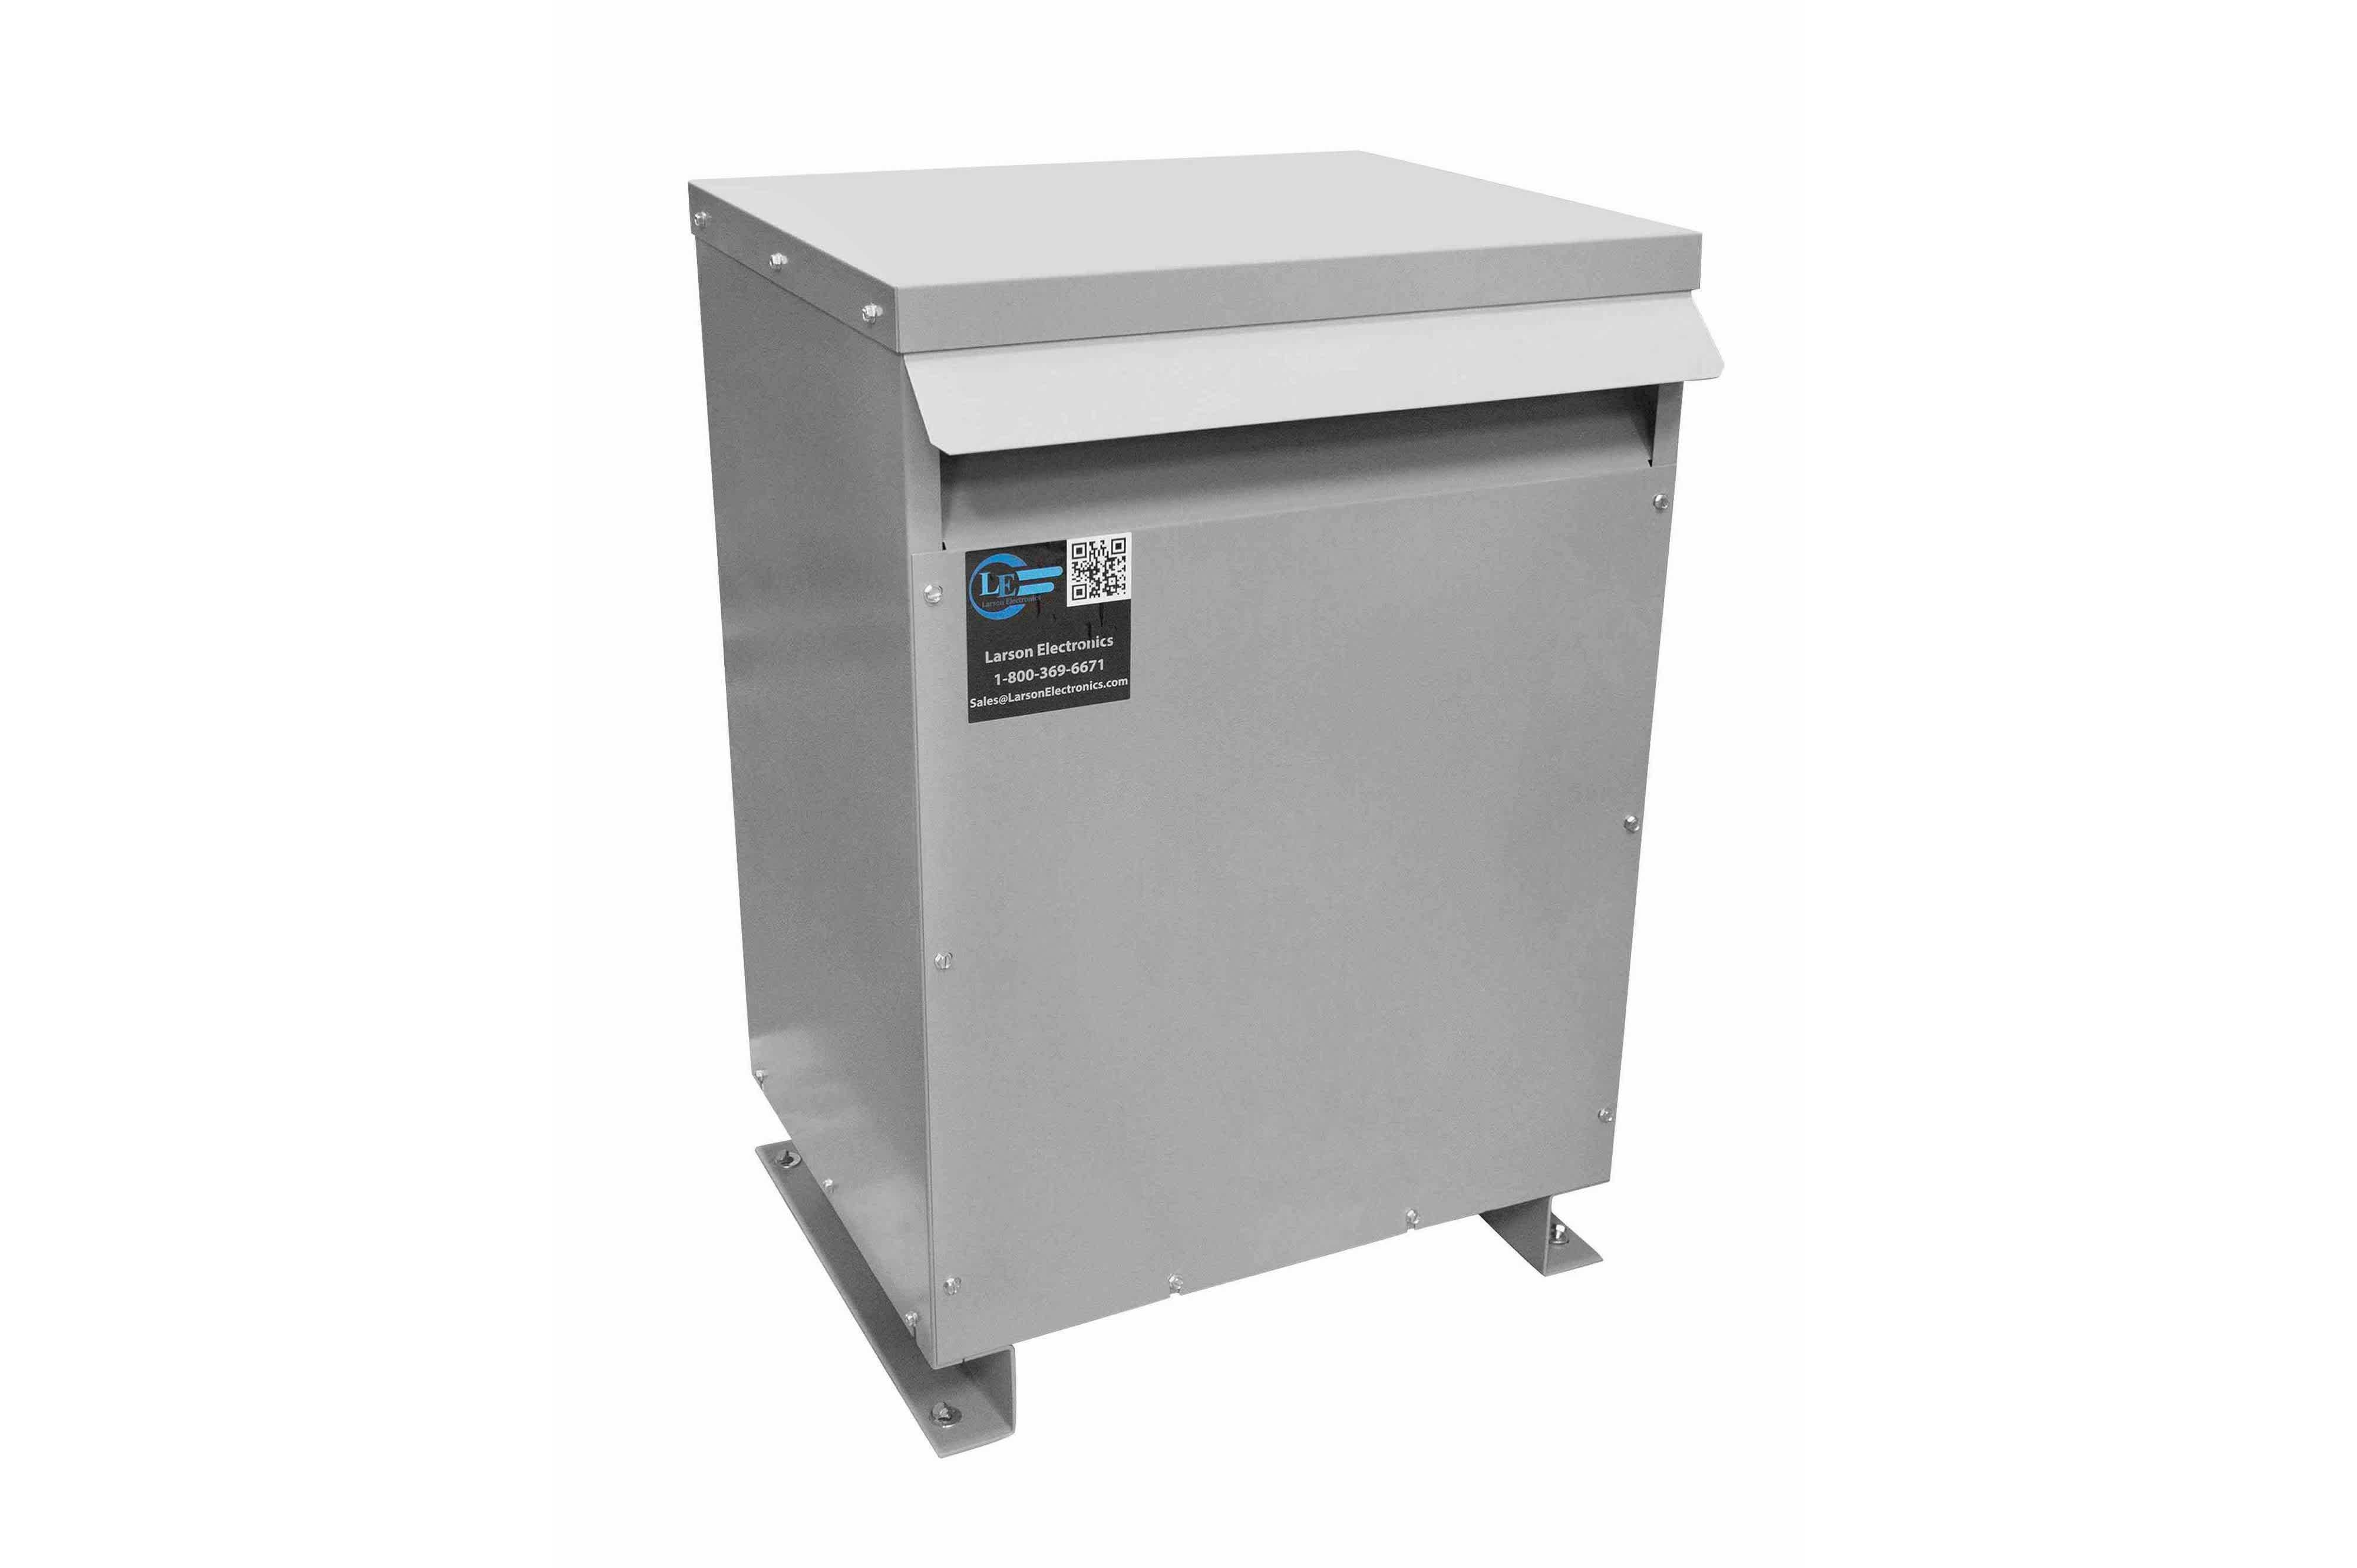 52.5 kVA 3PH Isolation Transformer, 440V Wye Primary, 208Y/120 Wye-N Secondary, N3R, Ventilated, 60 Hz